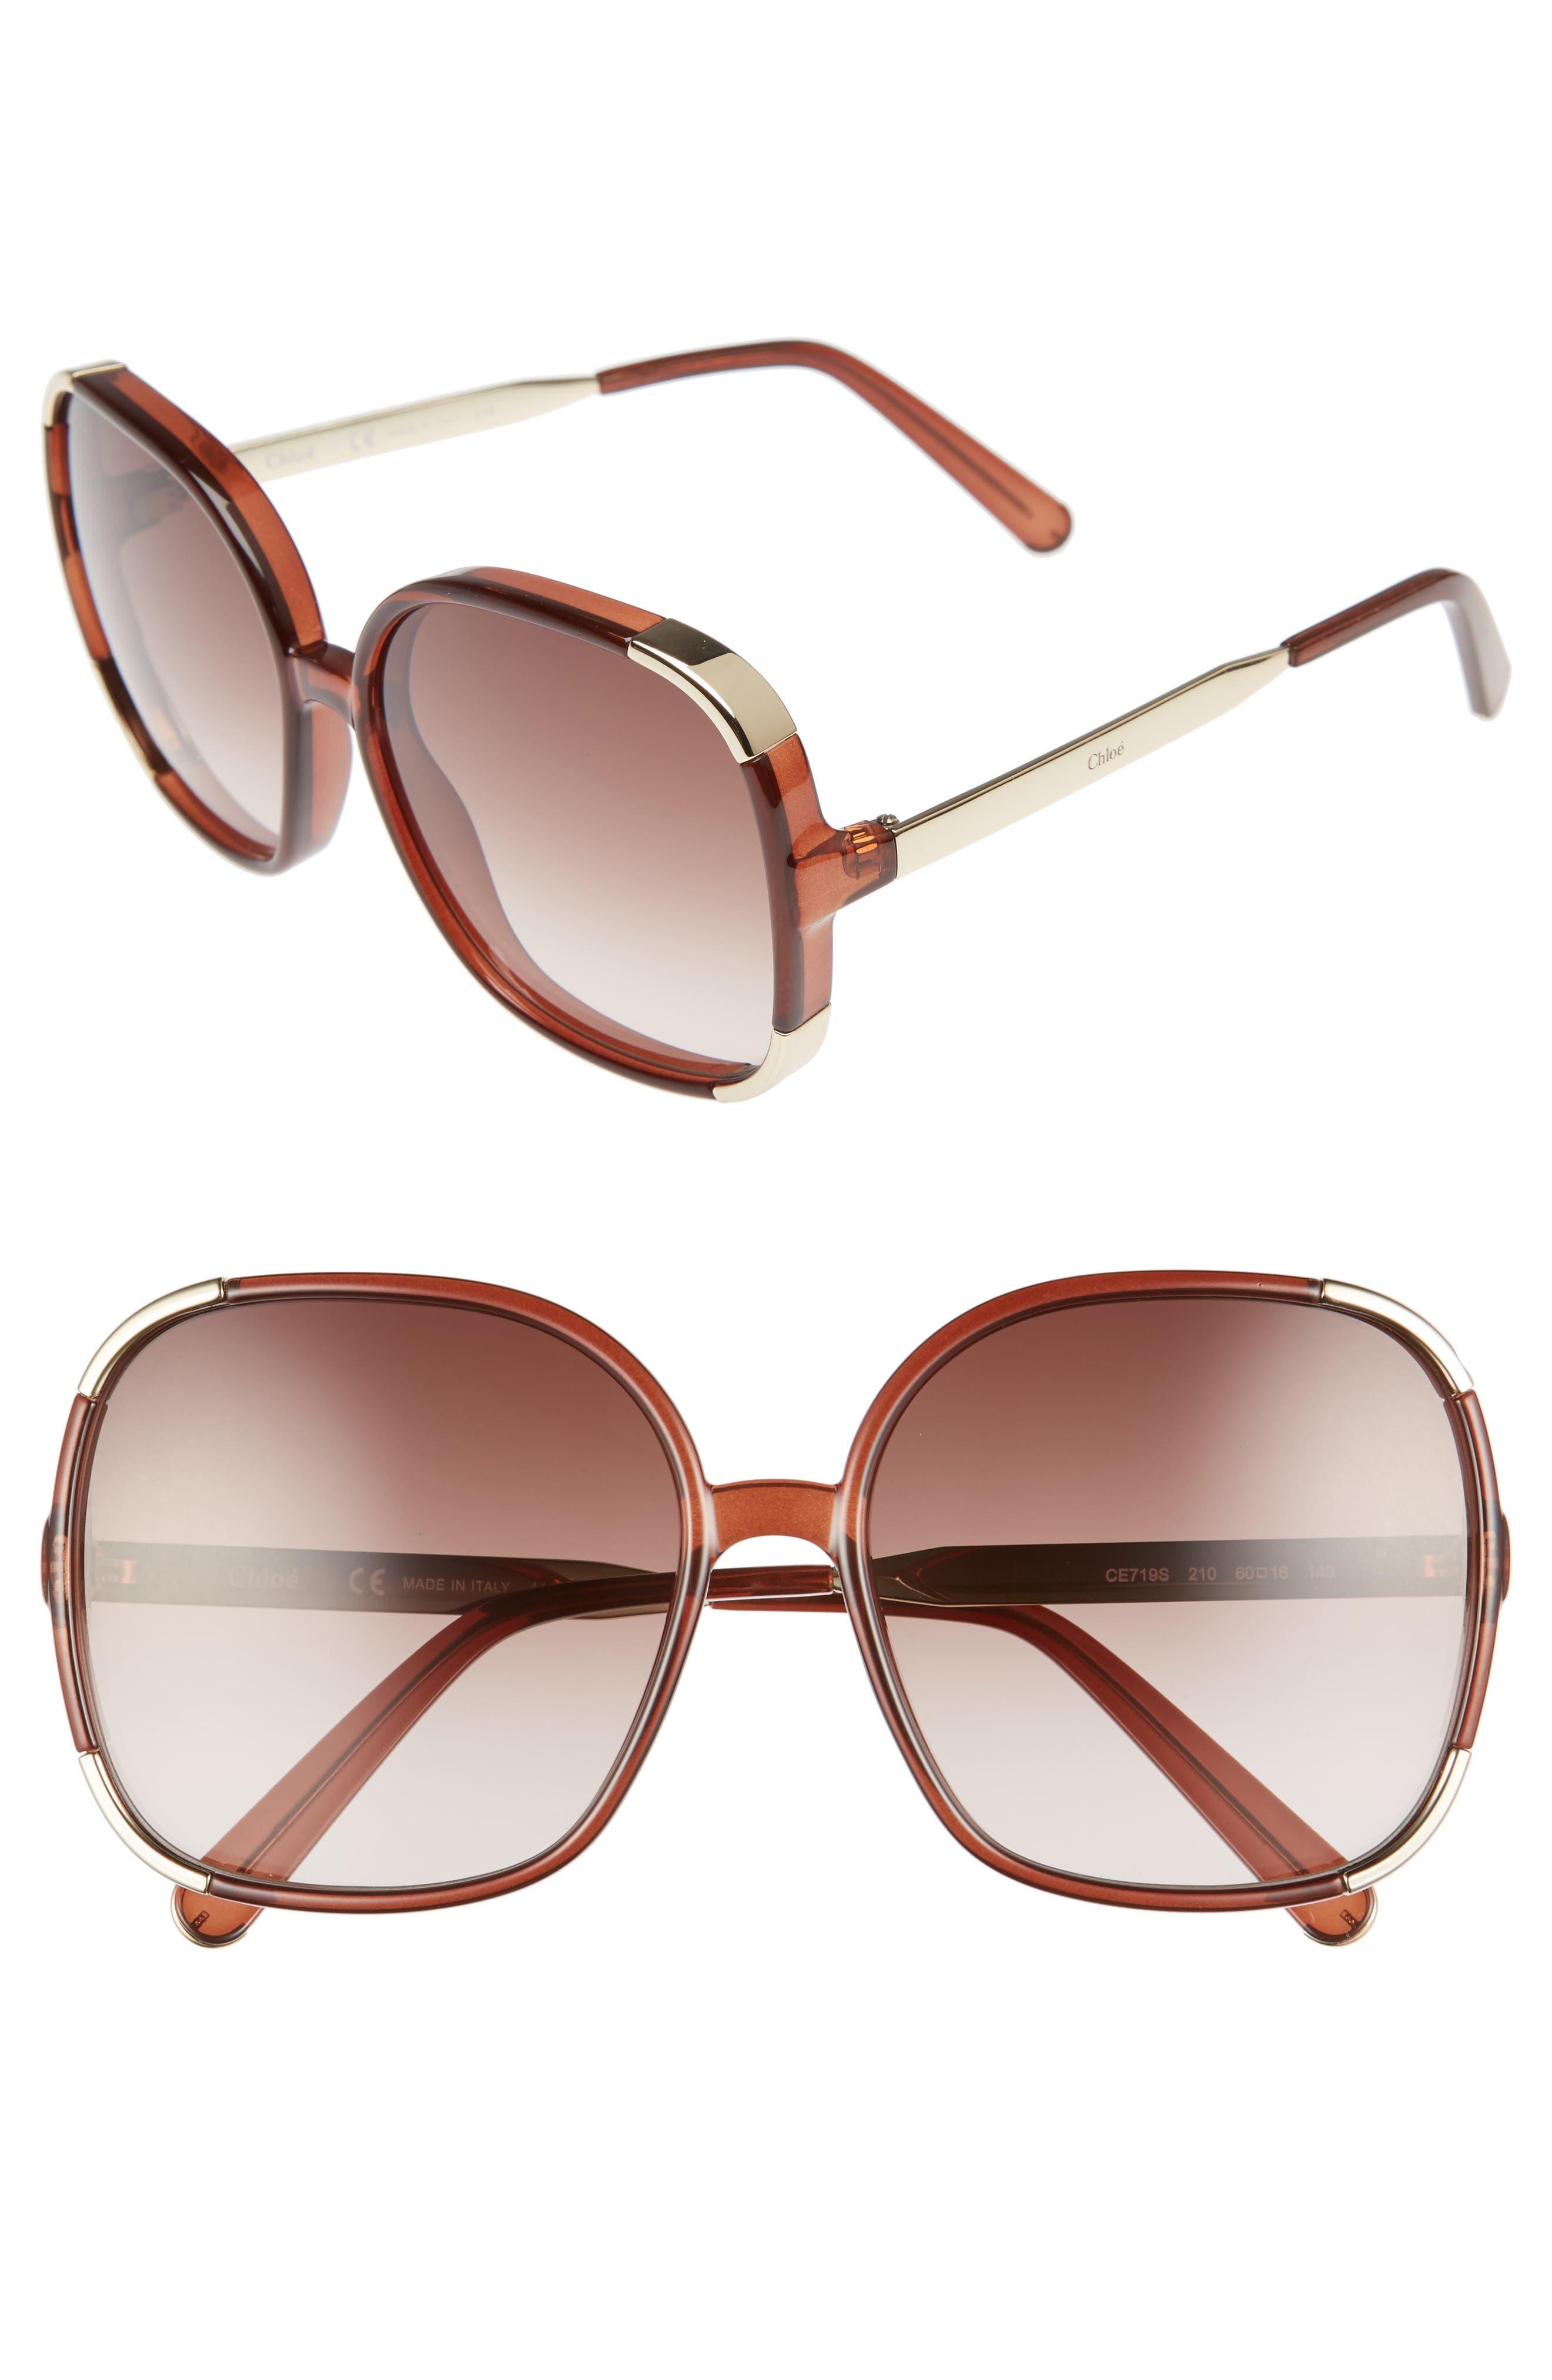 Sunglasses On Sale, Caramel, 2017, one size Chlo